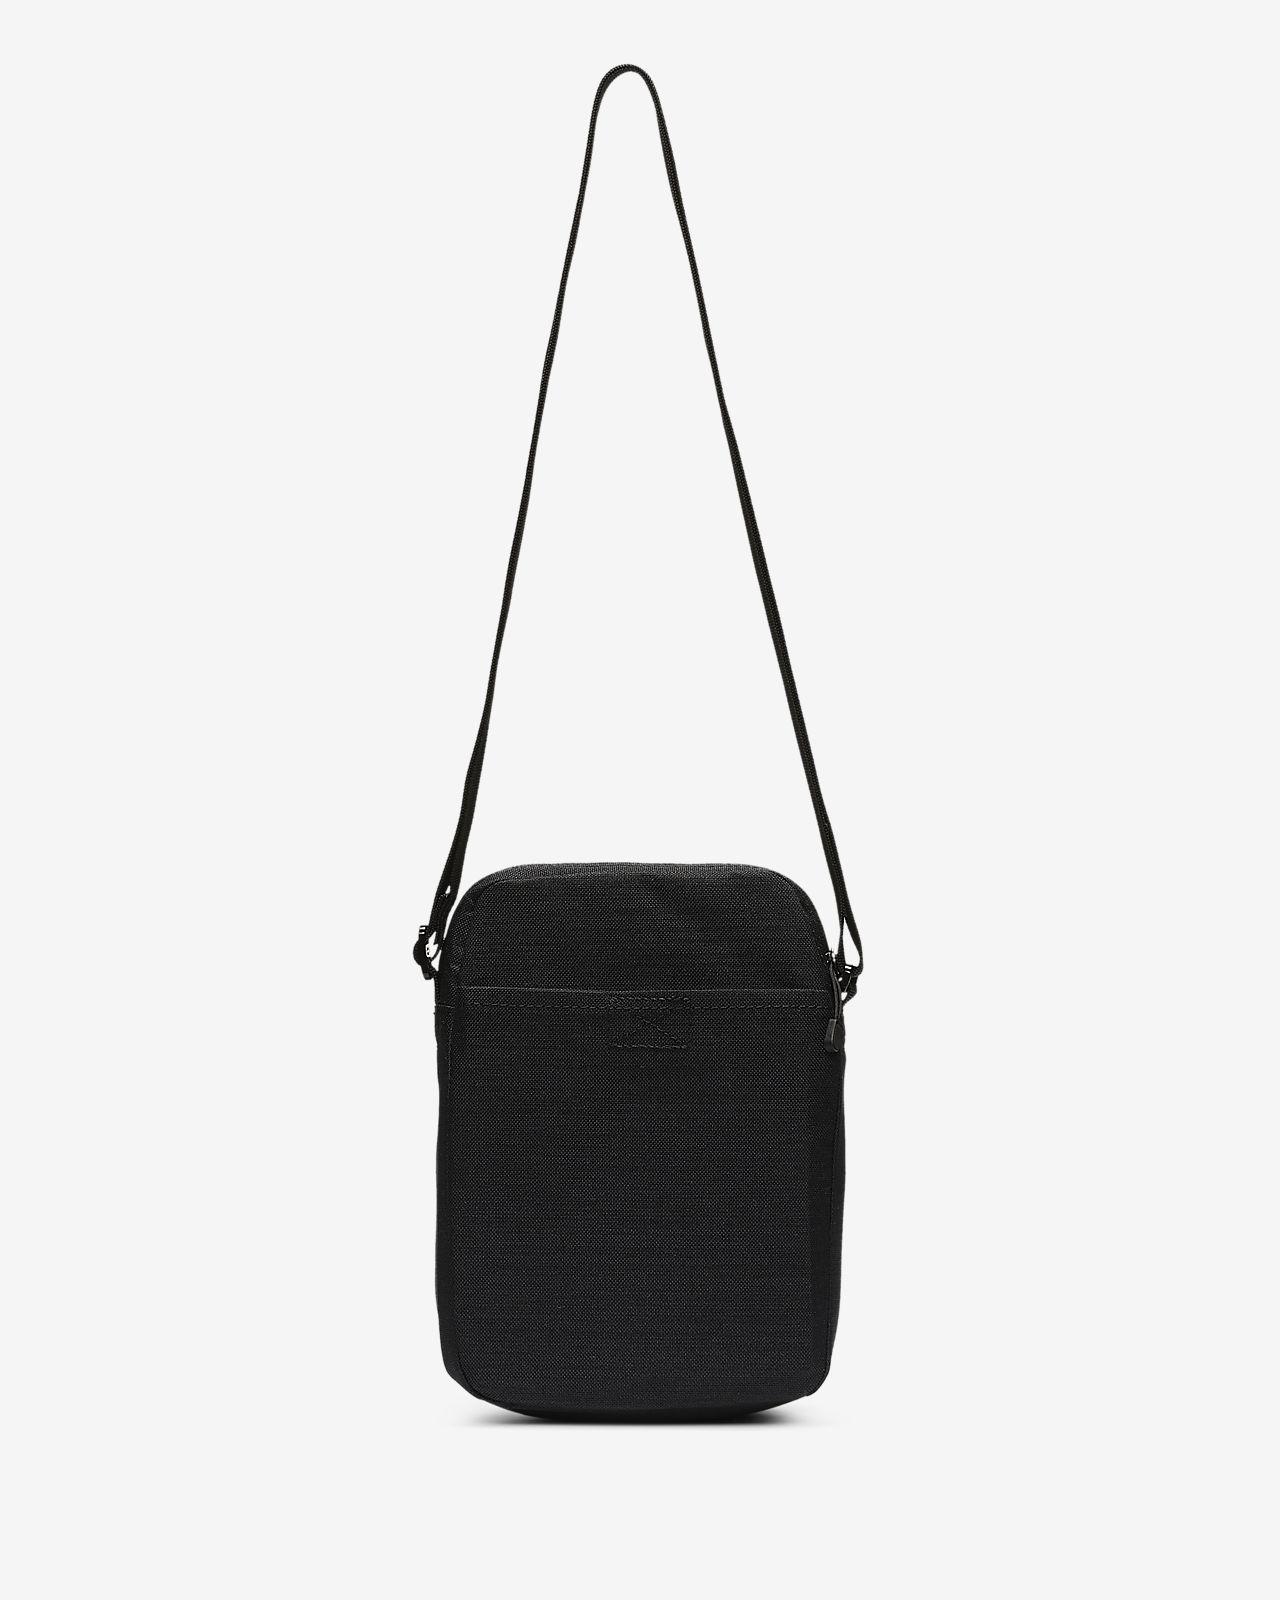 Nike Air Max Small Items Shoulder Bag Black With 2 Zip